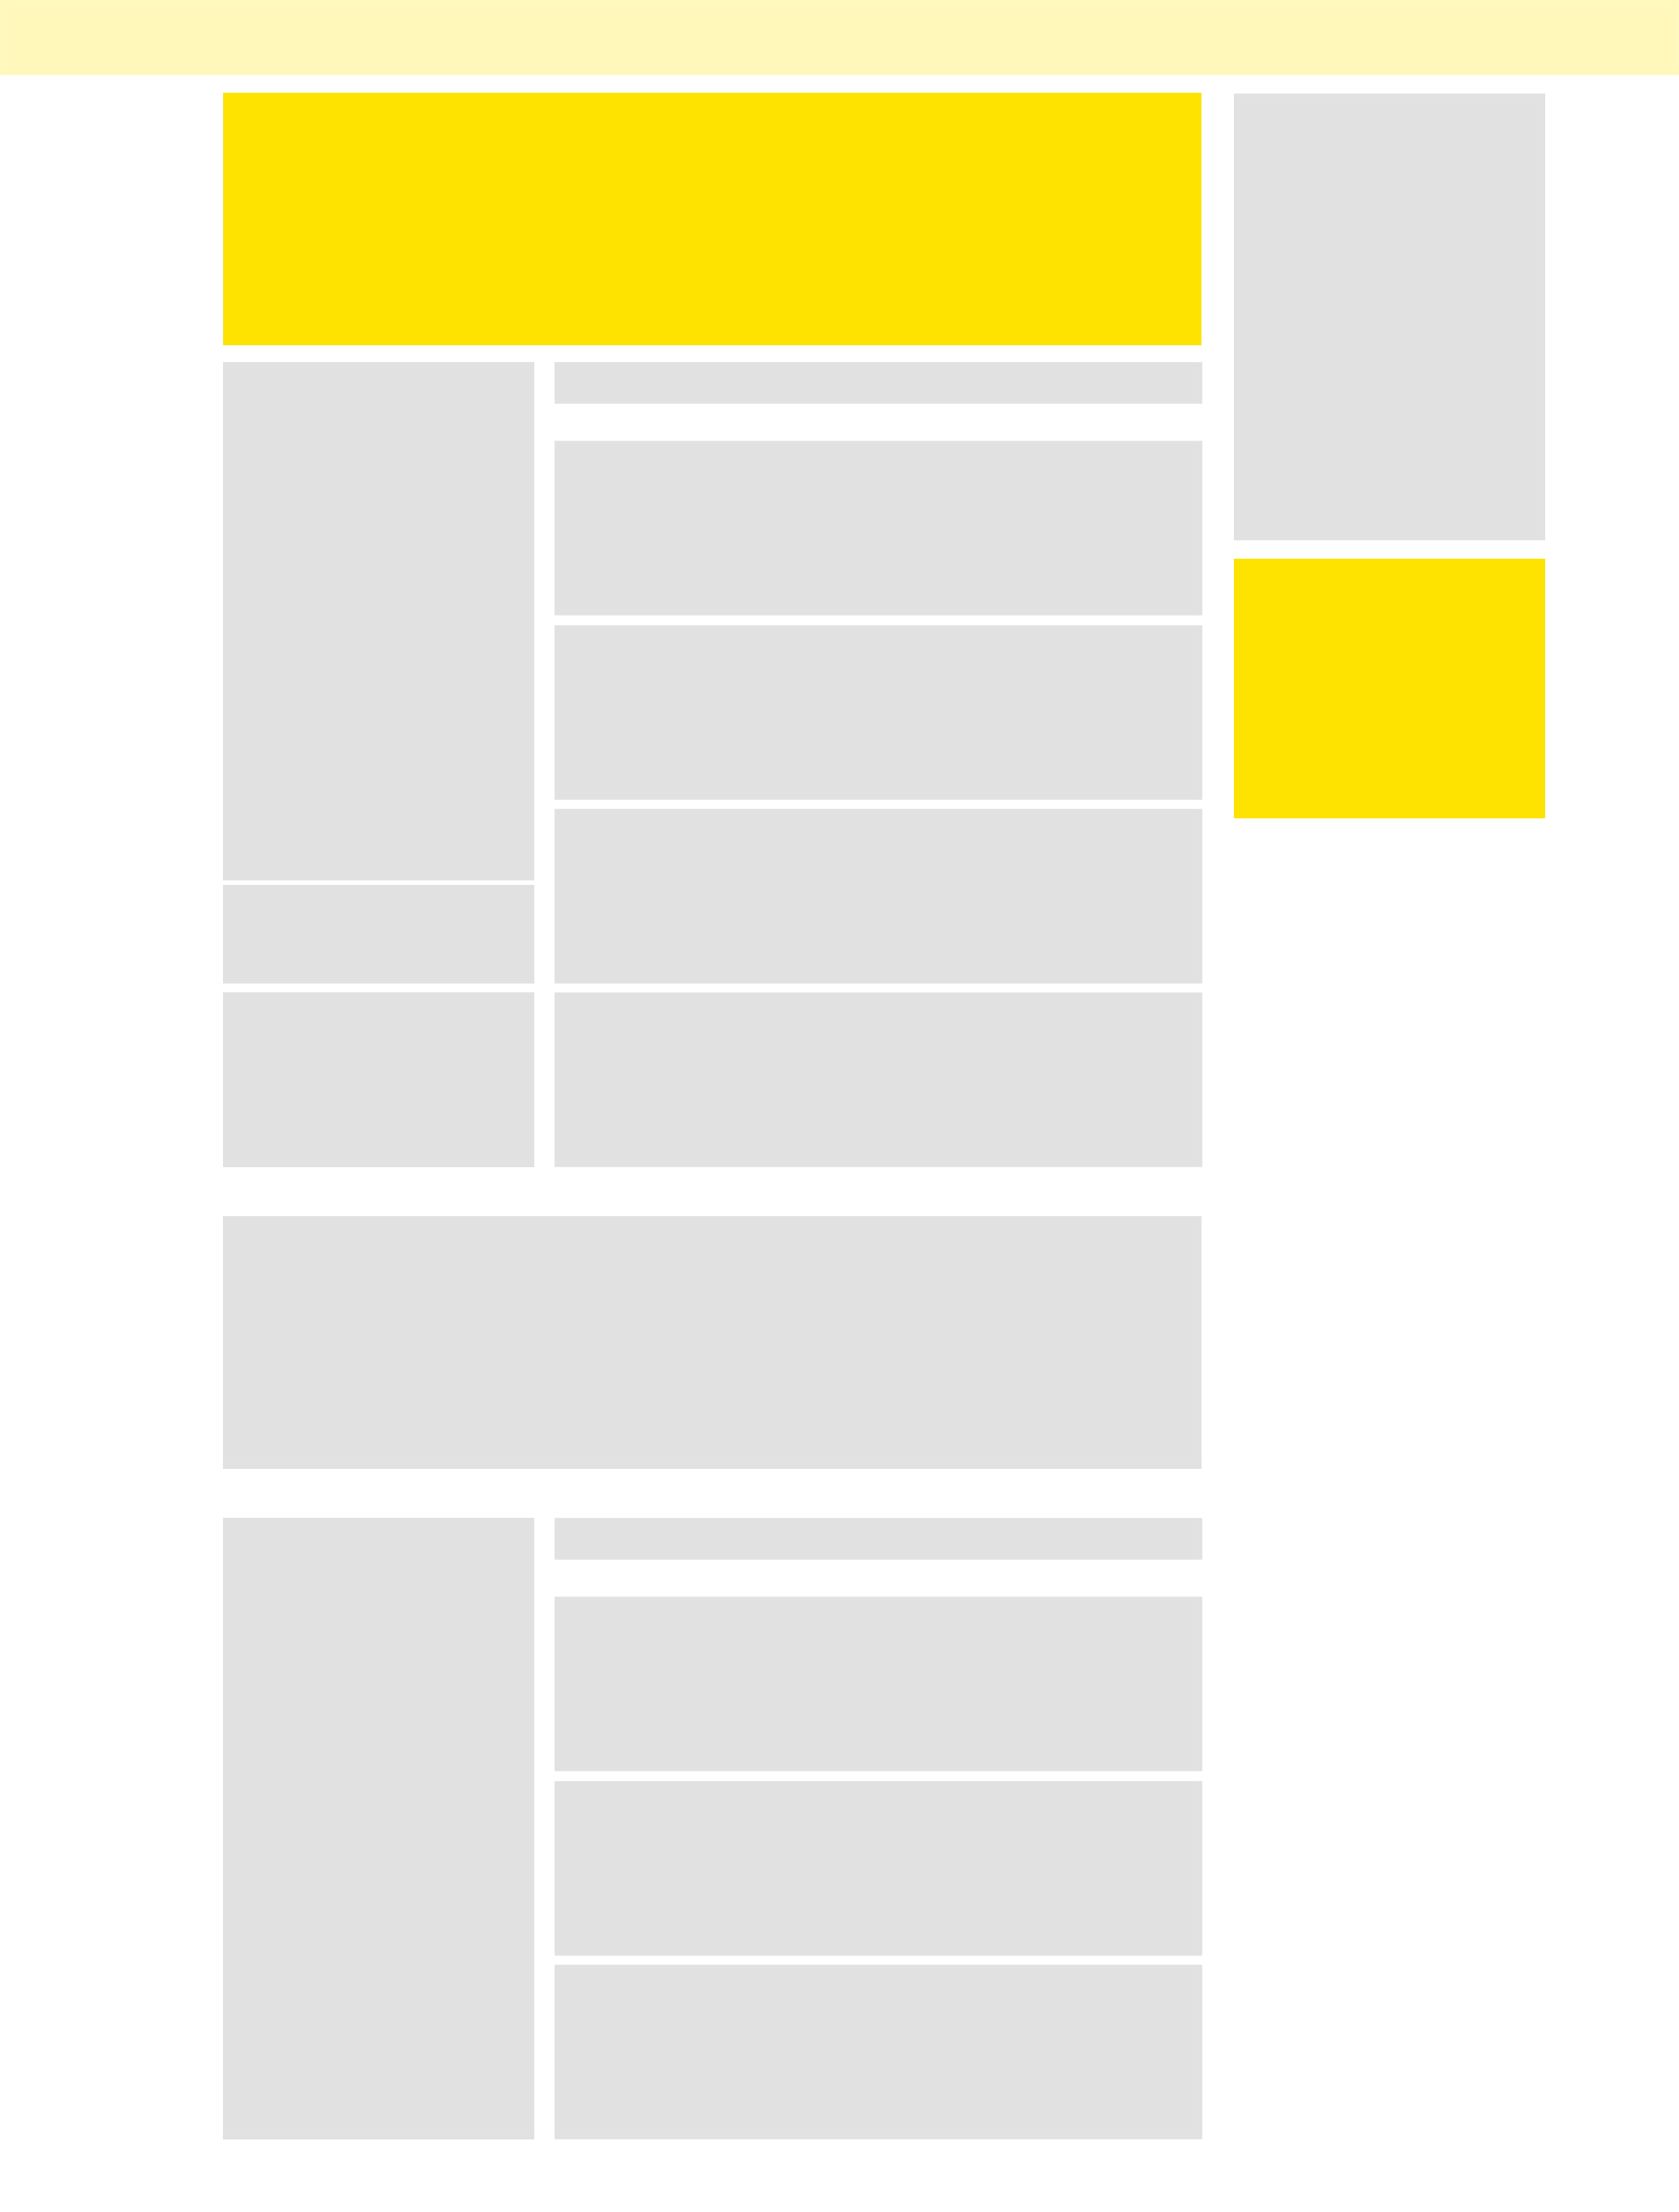 Placement Roadblock Desktop Tall